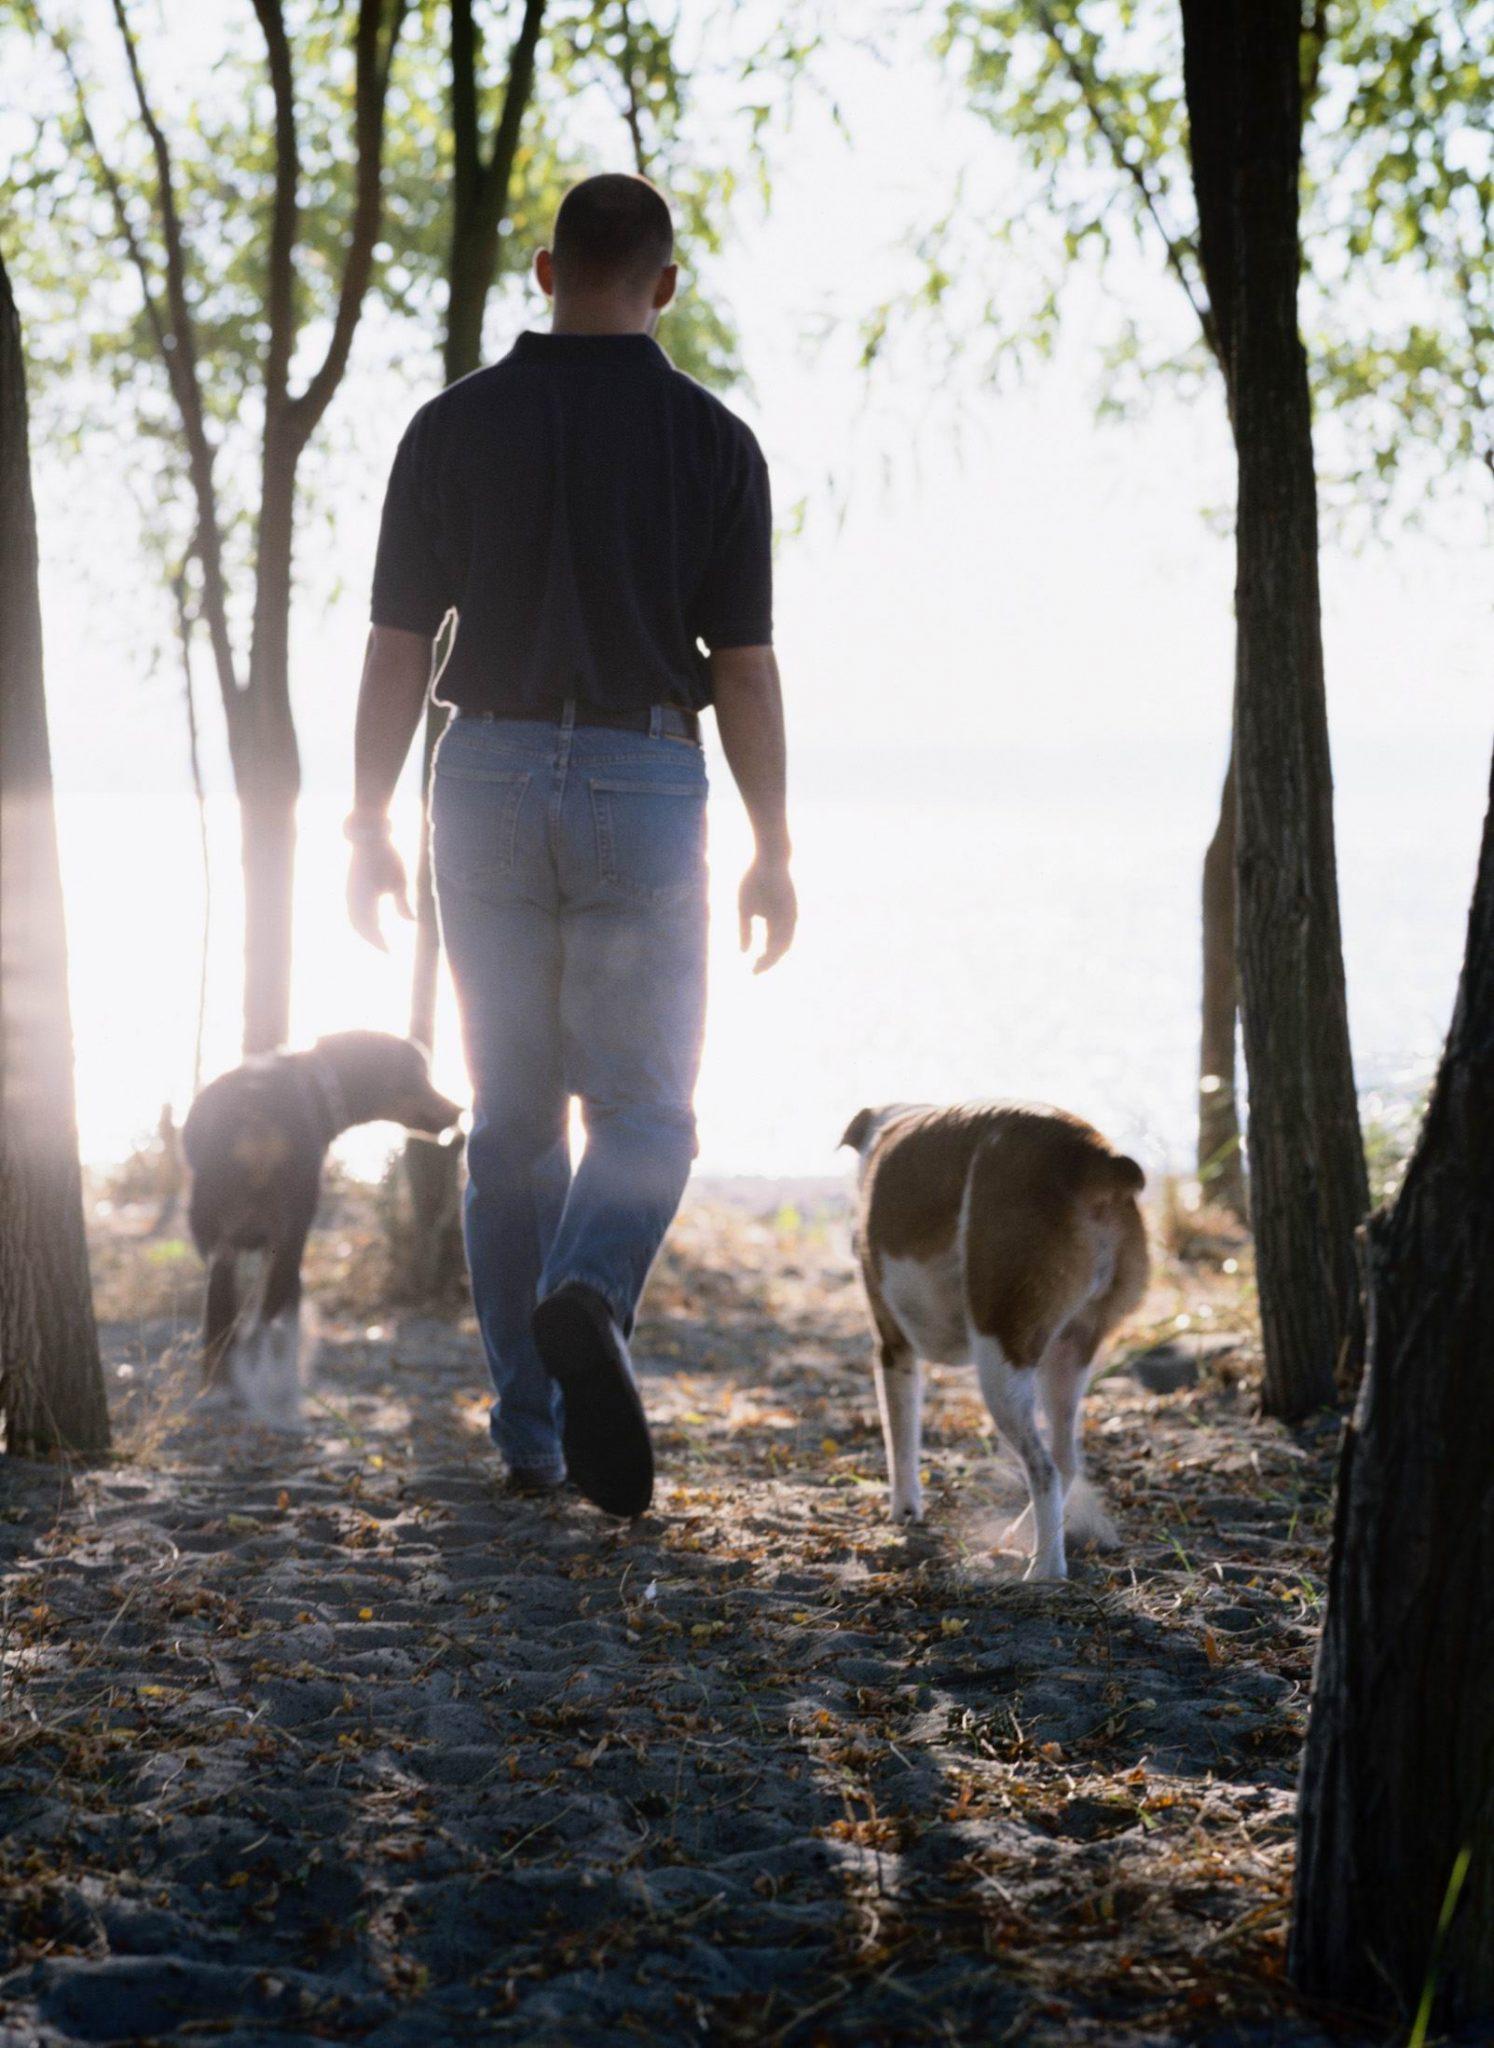 Tick & Flea Season 2013 – Protect Your Pets!